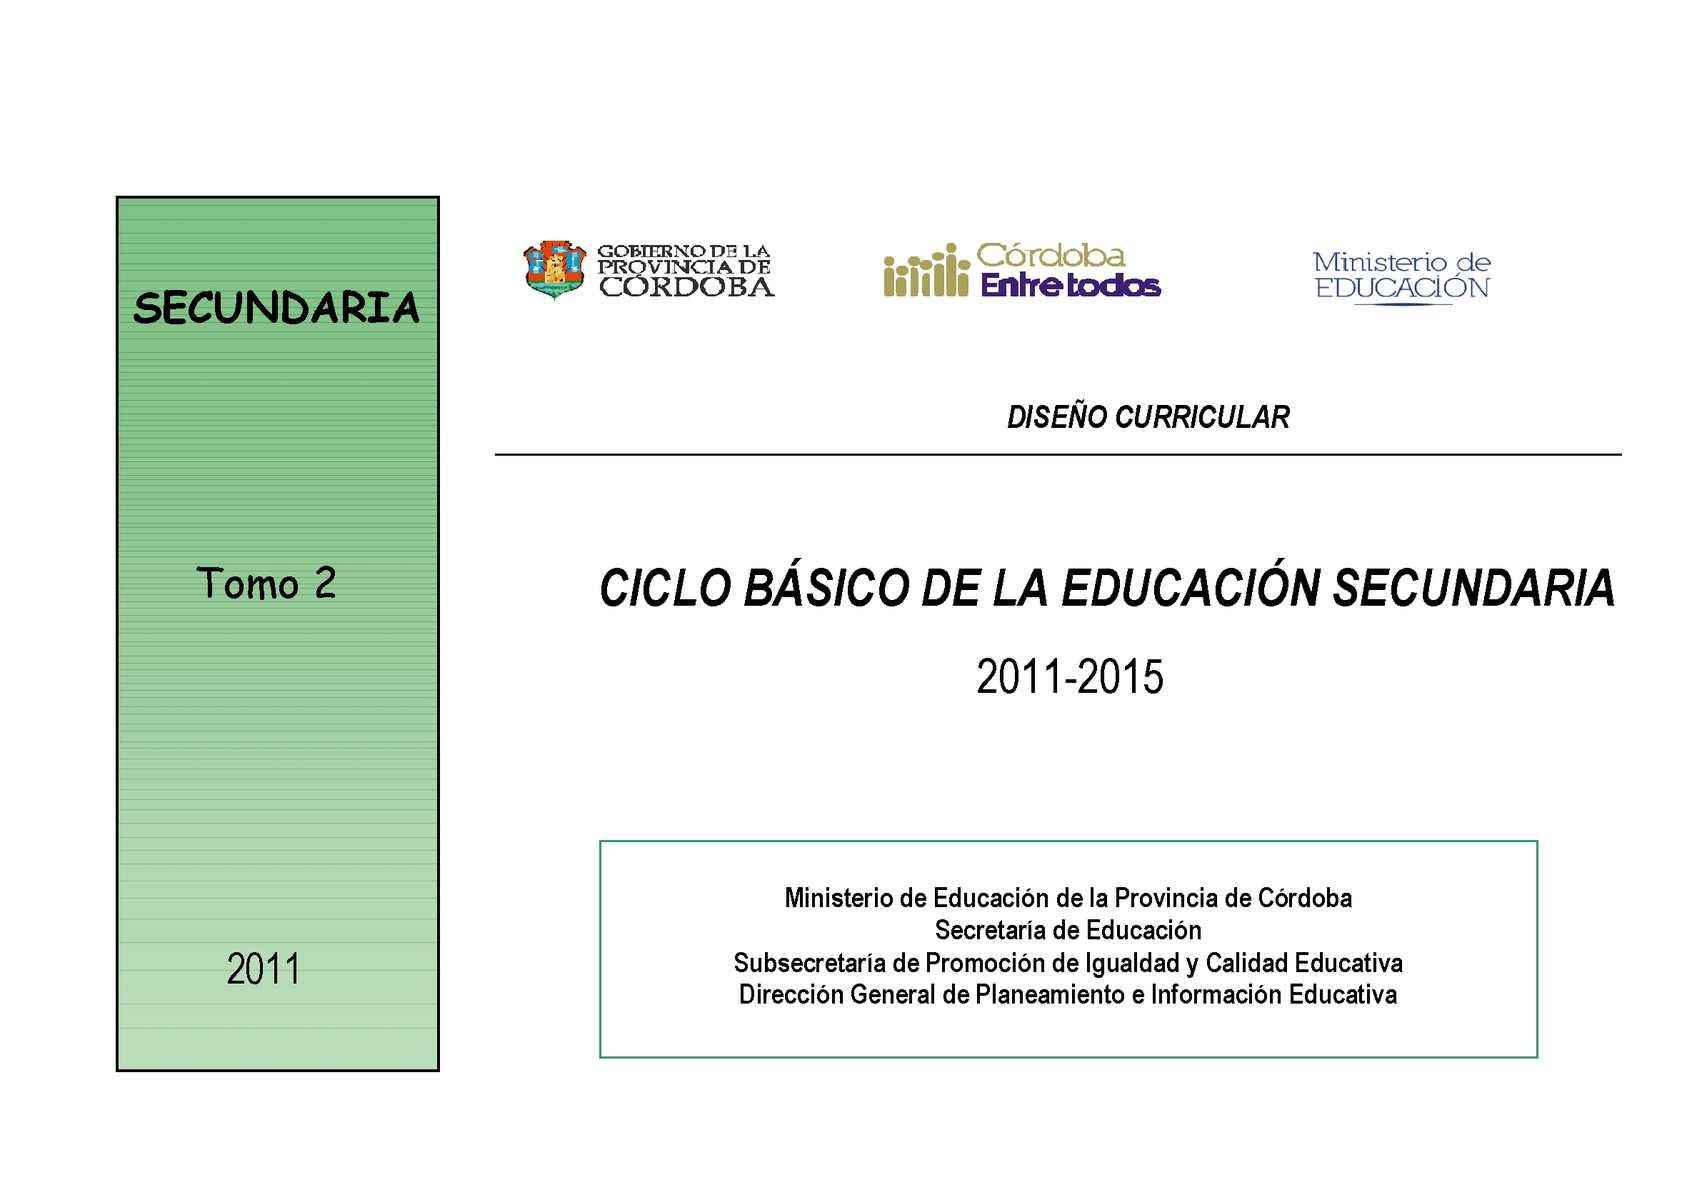 Calaméo - Diseño curricular C. B. Córdoba